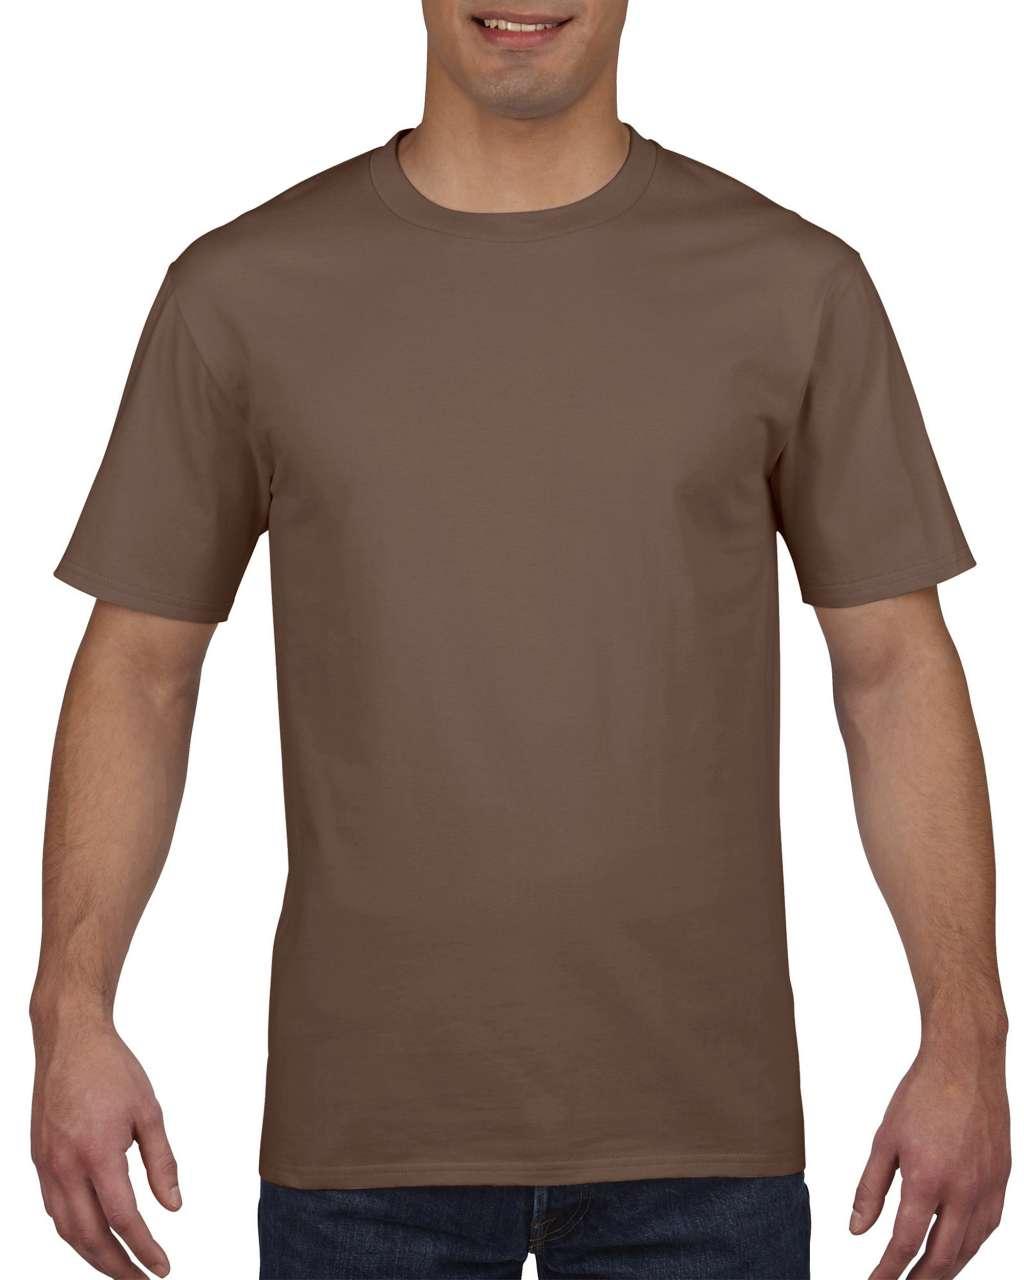 Tricou barbatesc Gildan Premium Cotton bumbac 185 g/mp serigrafie termotransfer broderie DTG | Toroadv.ro